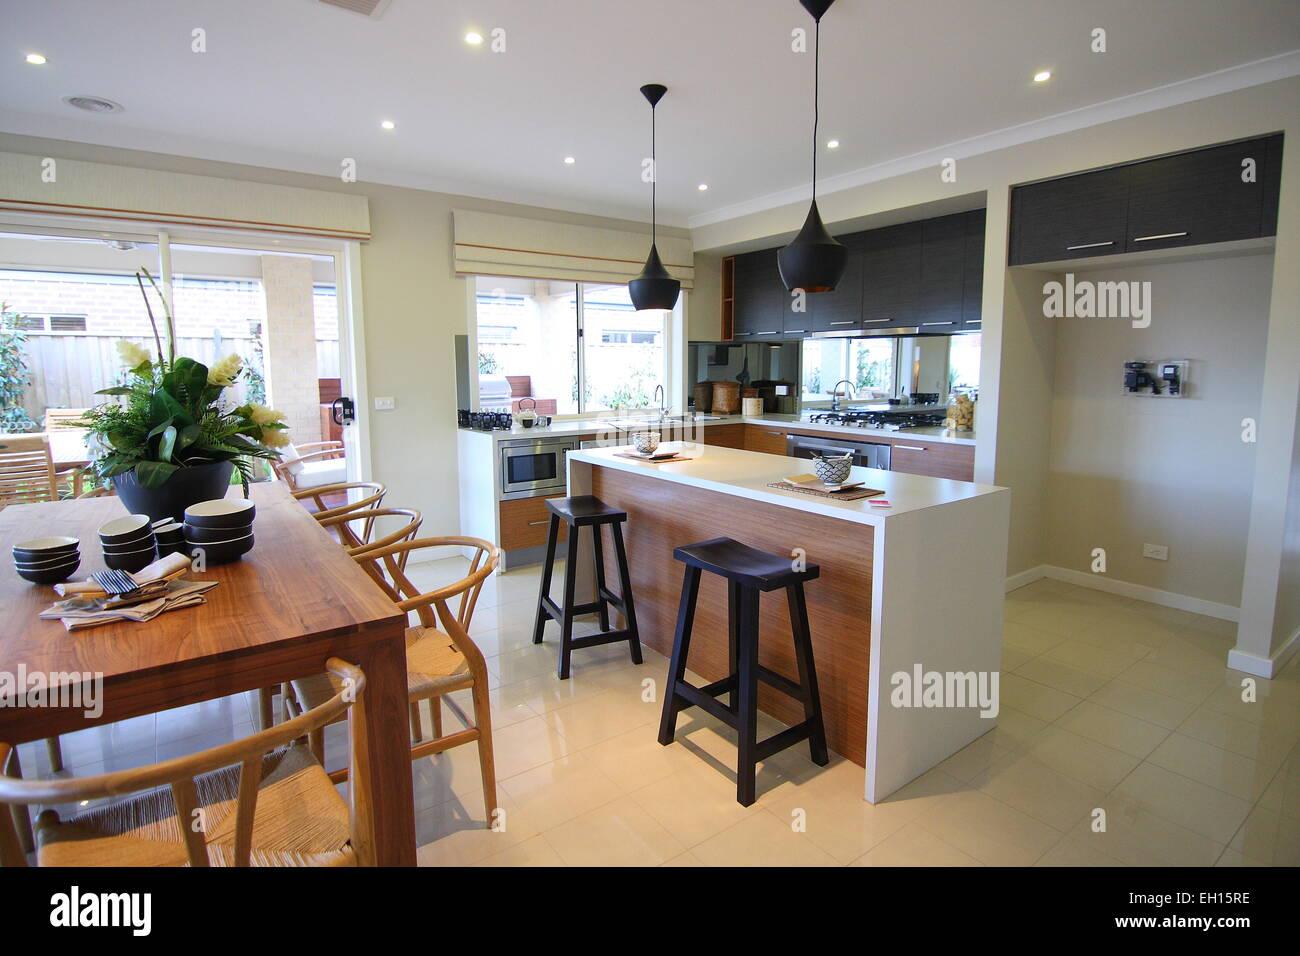 Bianca e moderna cucina con pavimento di piastrelle foto